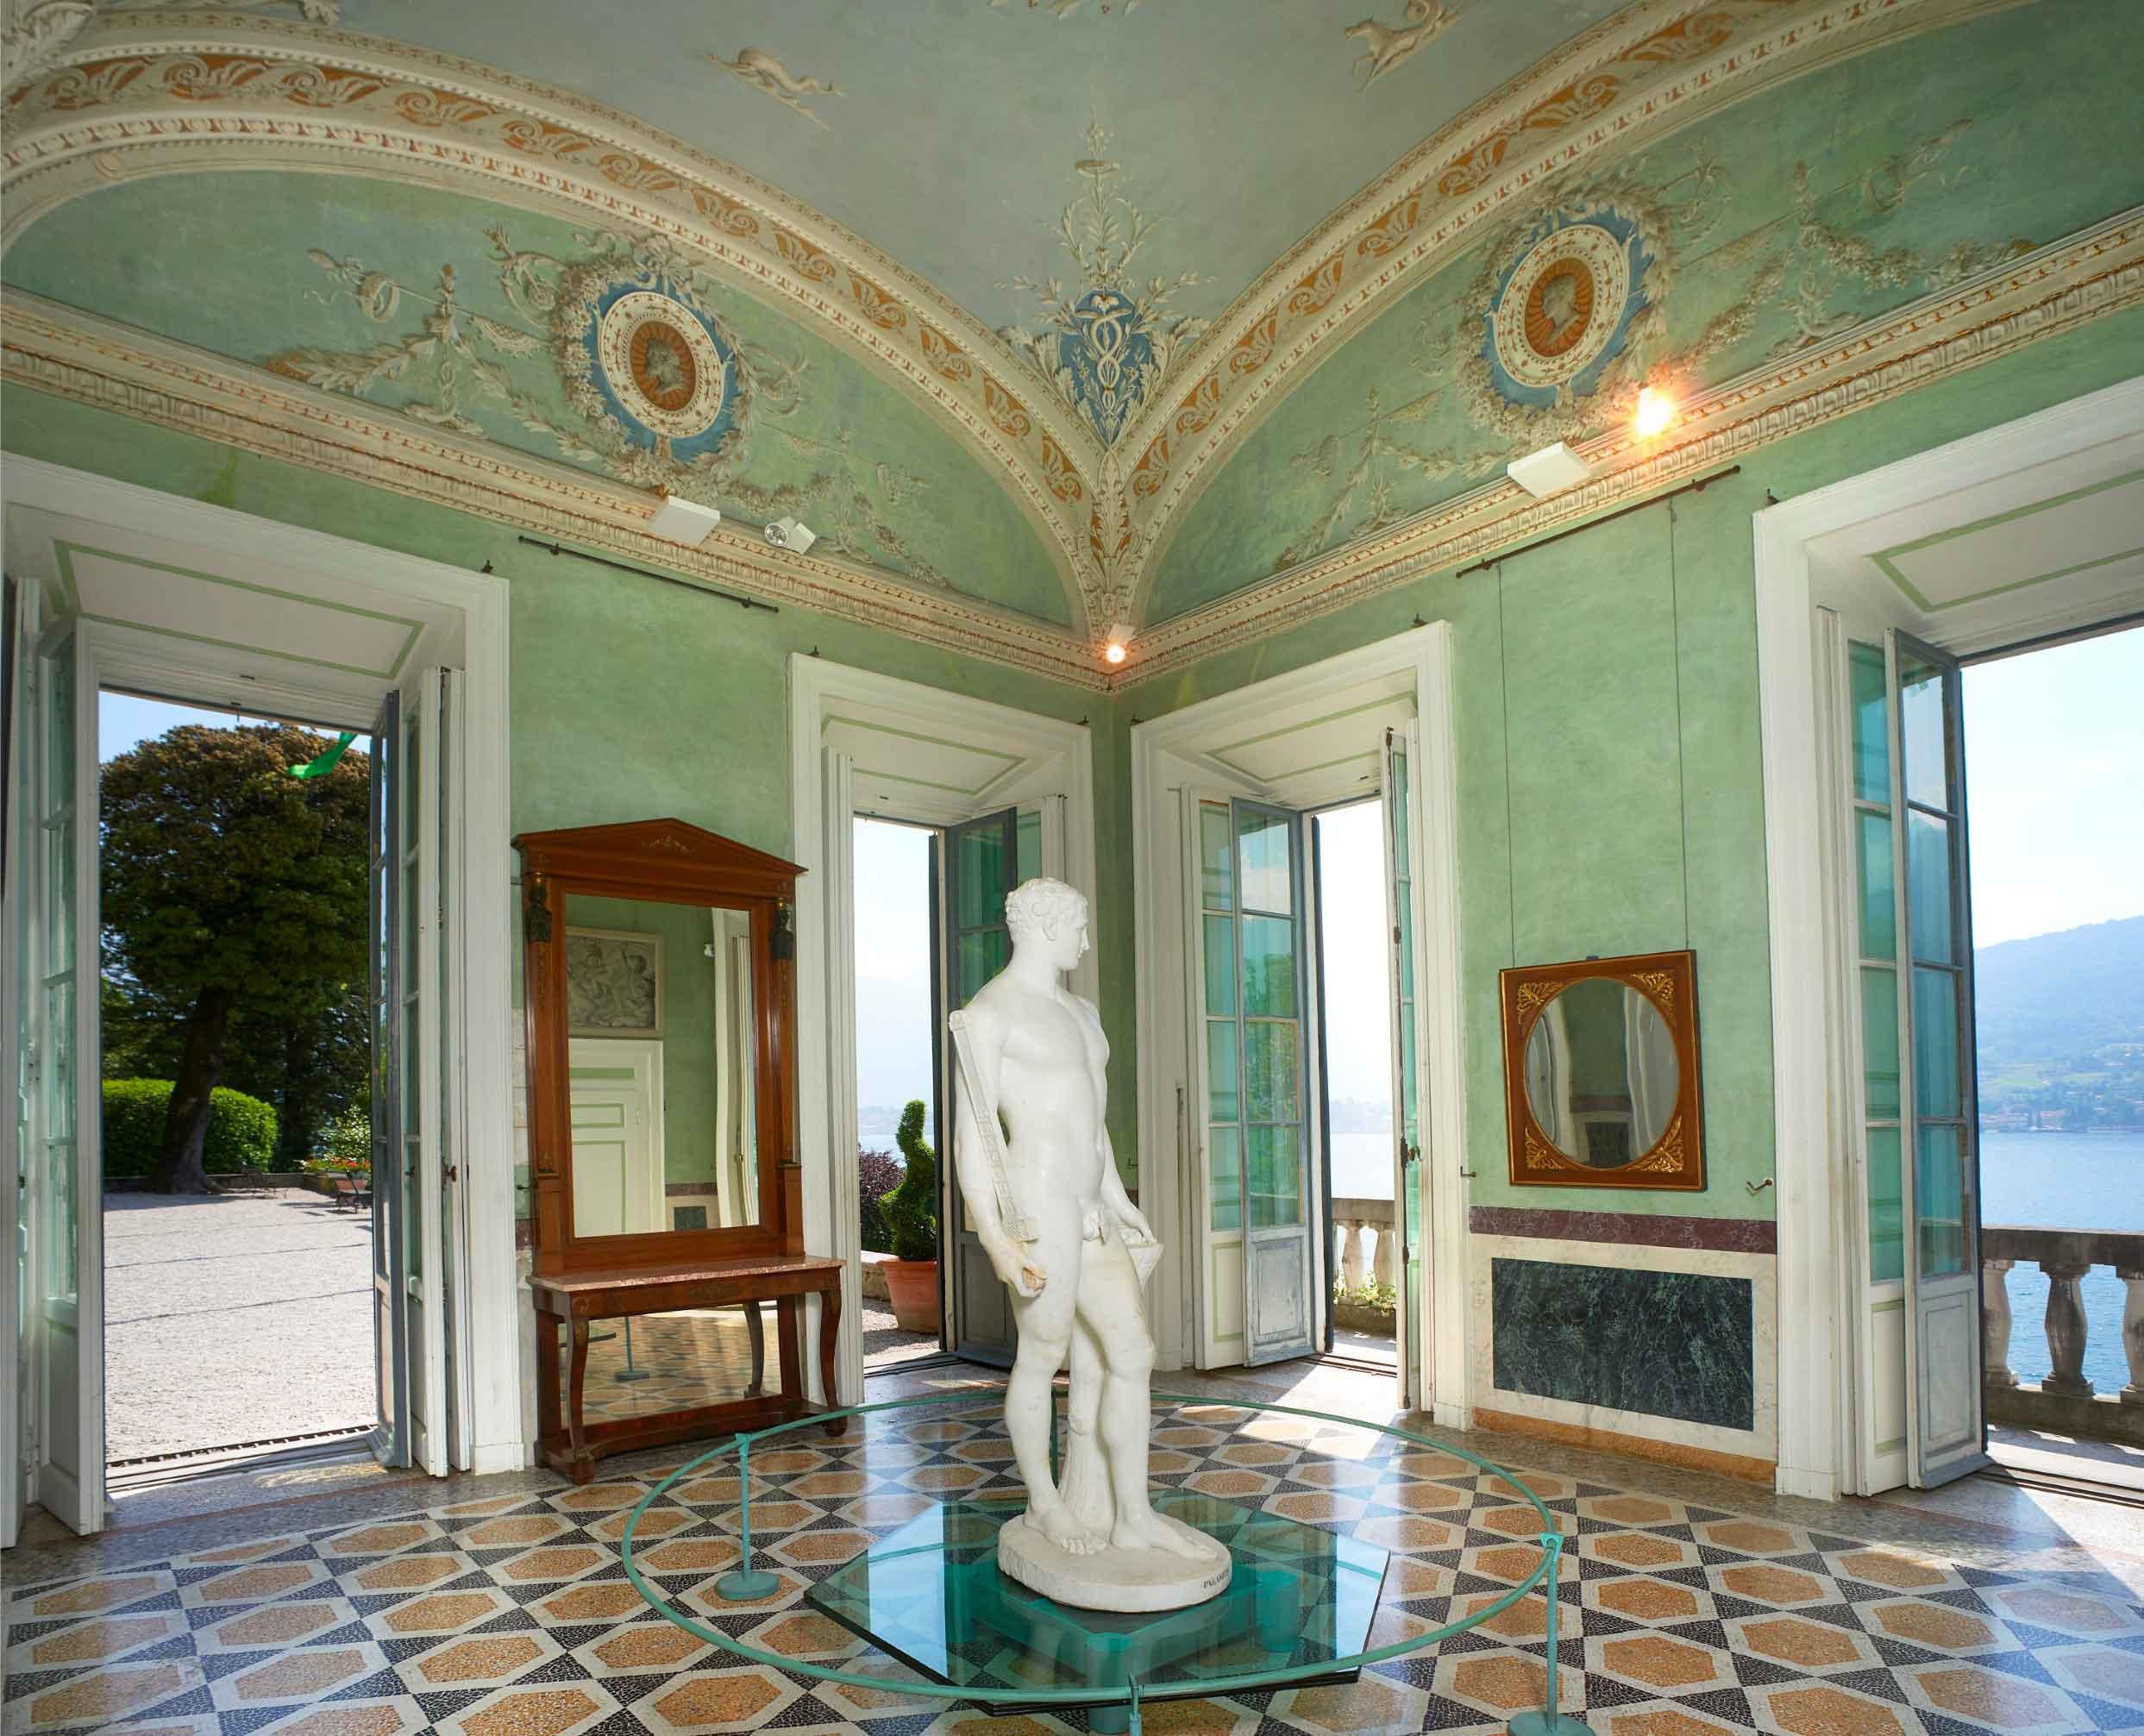 Villa_Carlotta_11